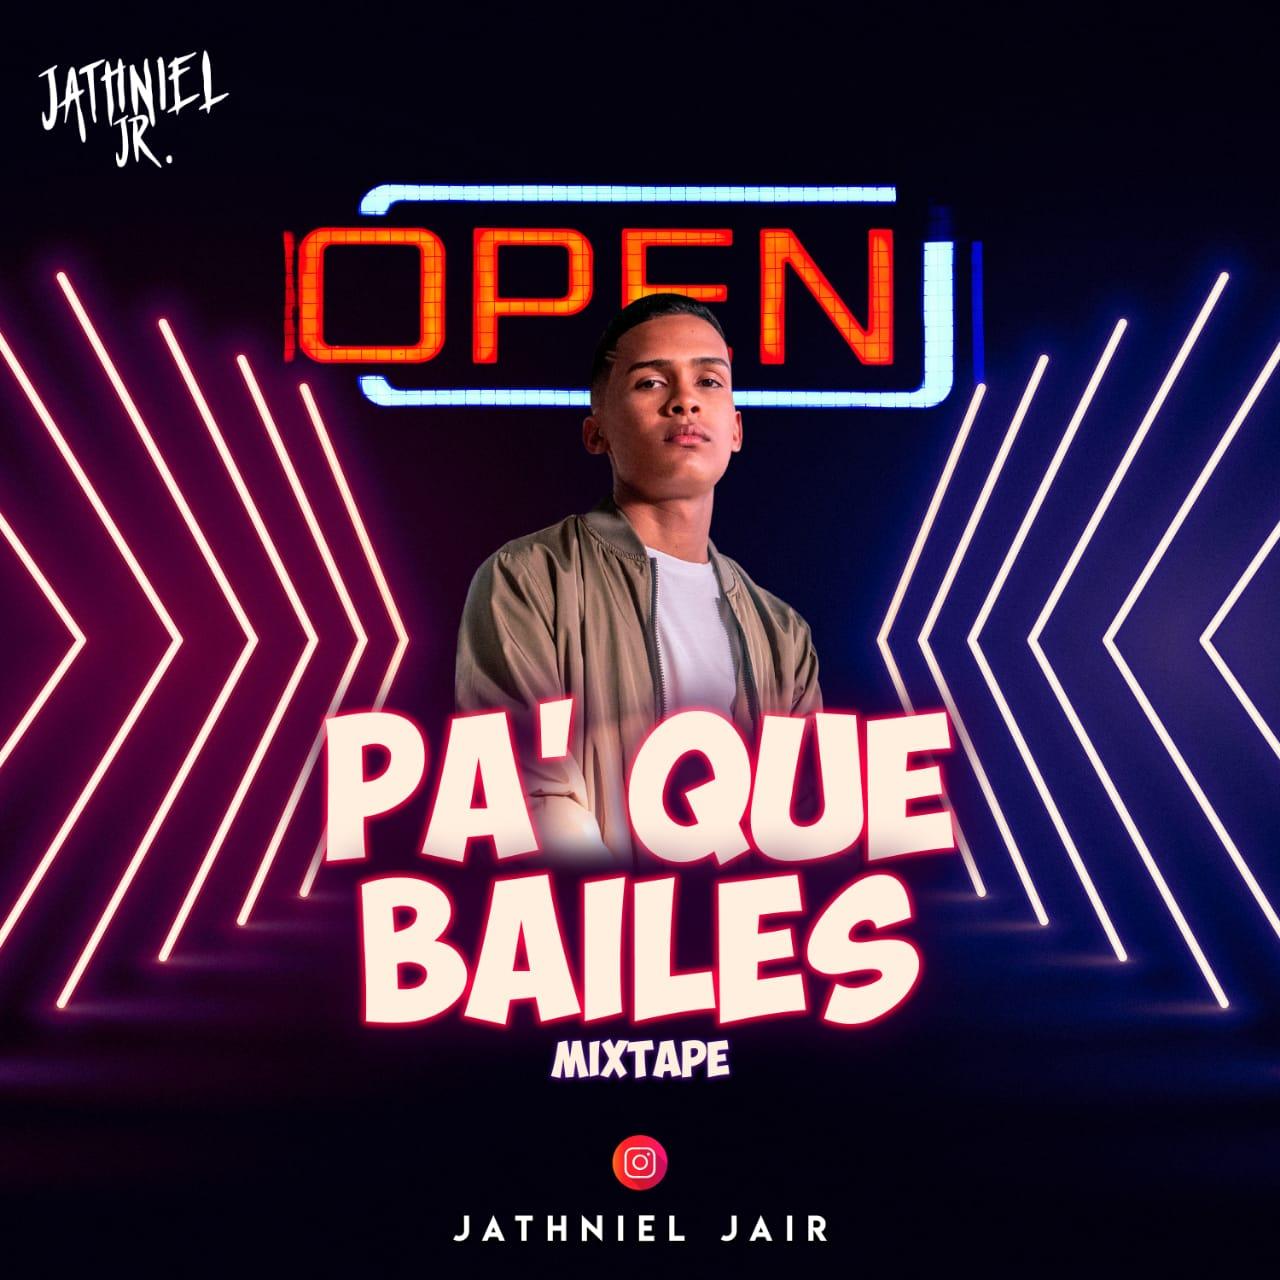 Dj Jathniel Jr - Pa Que Bailes Mixtape